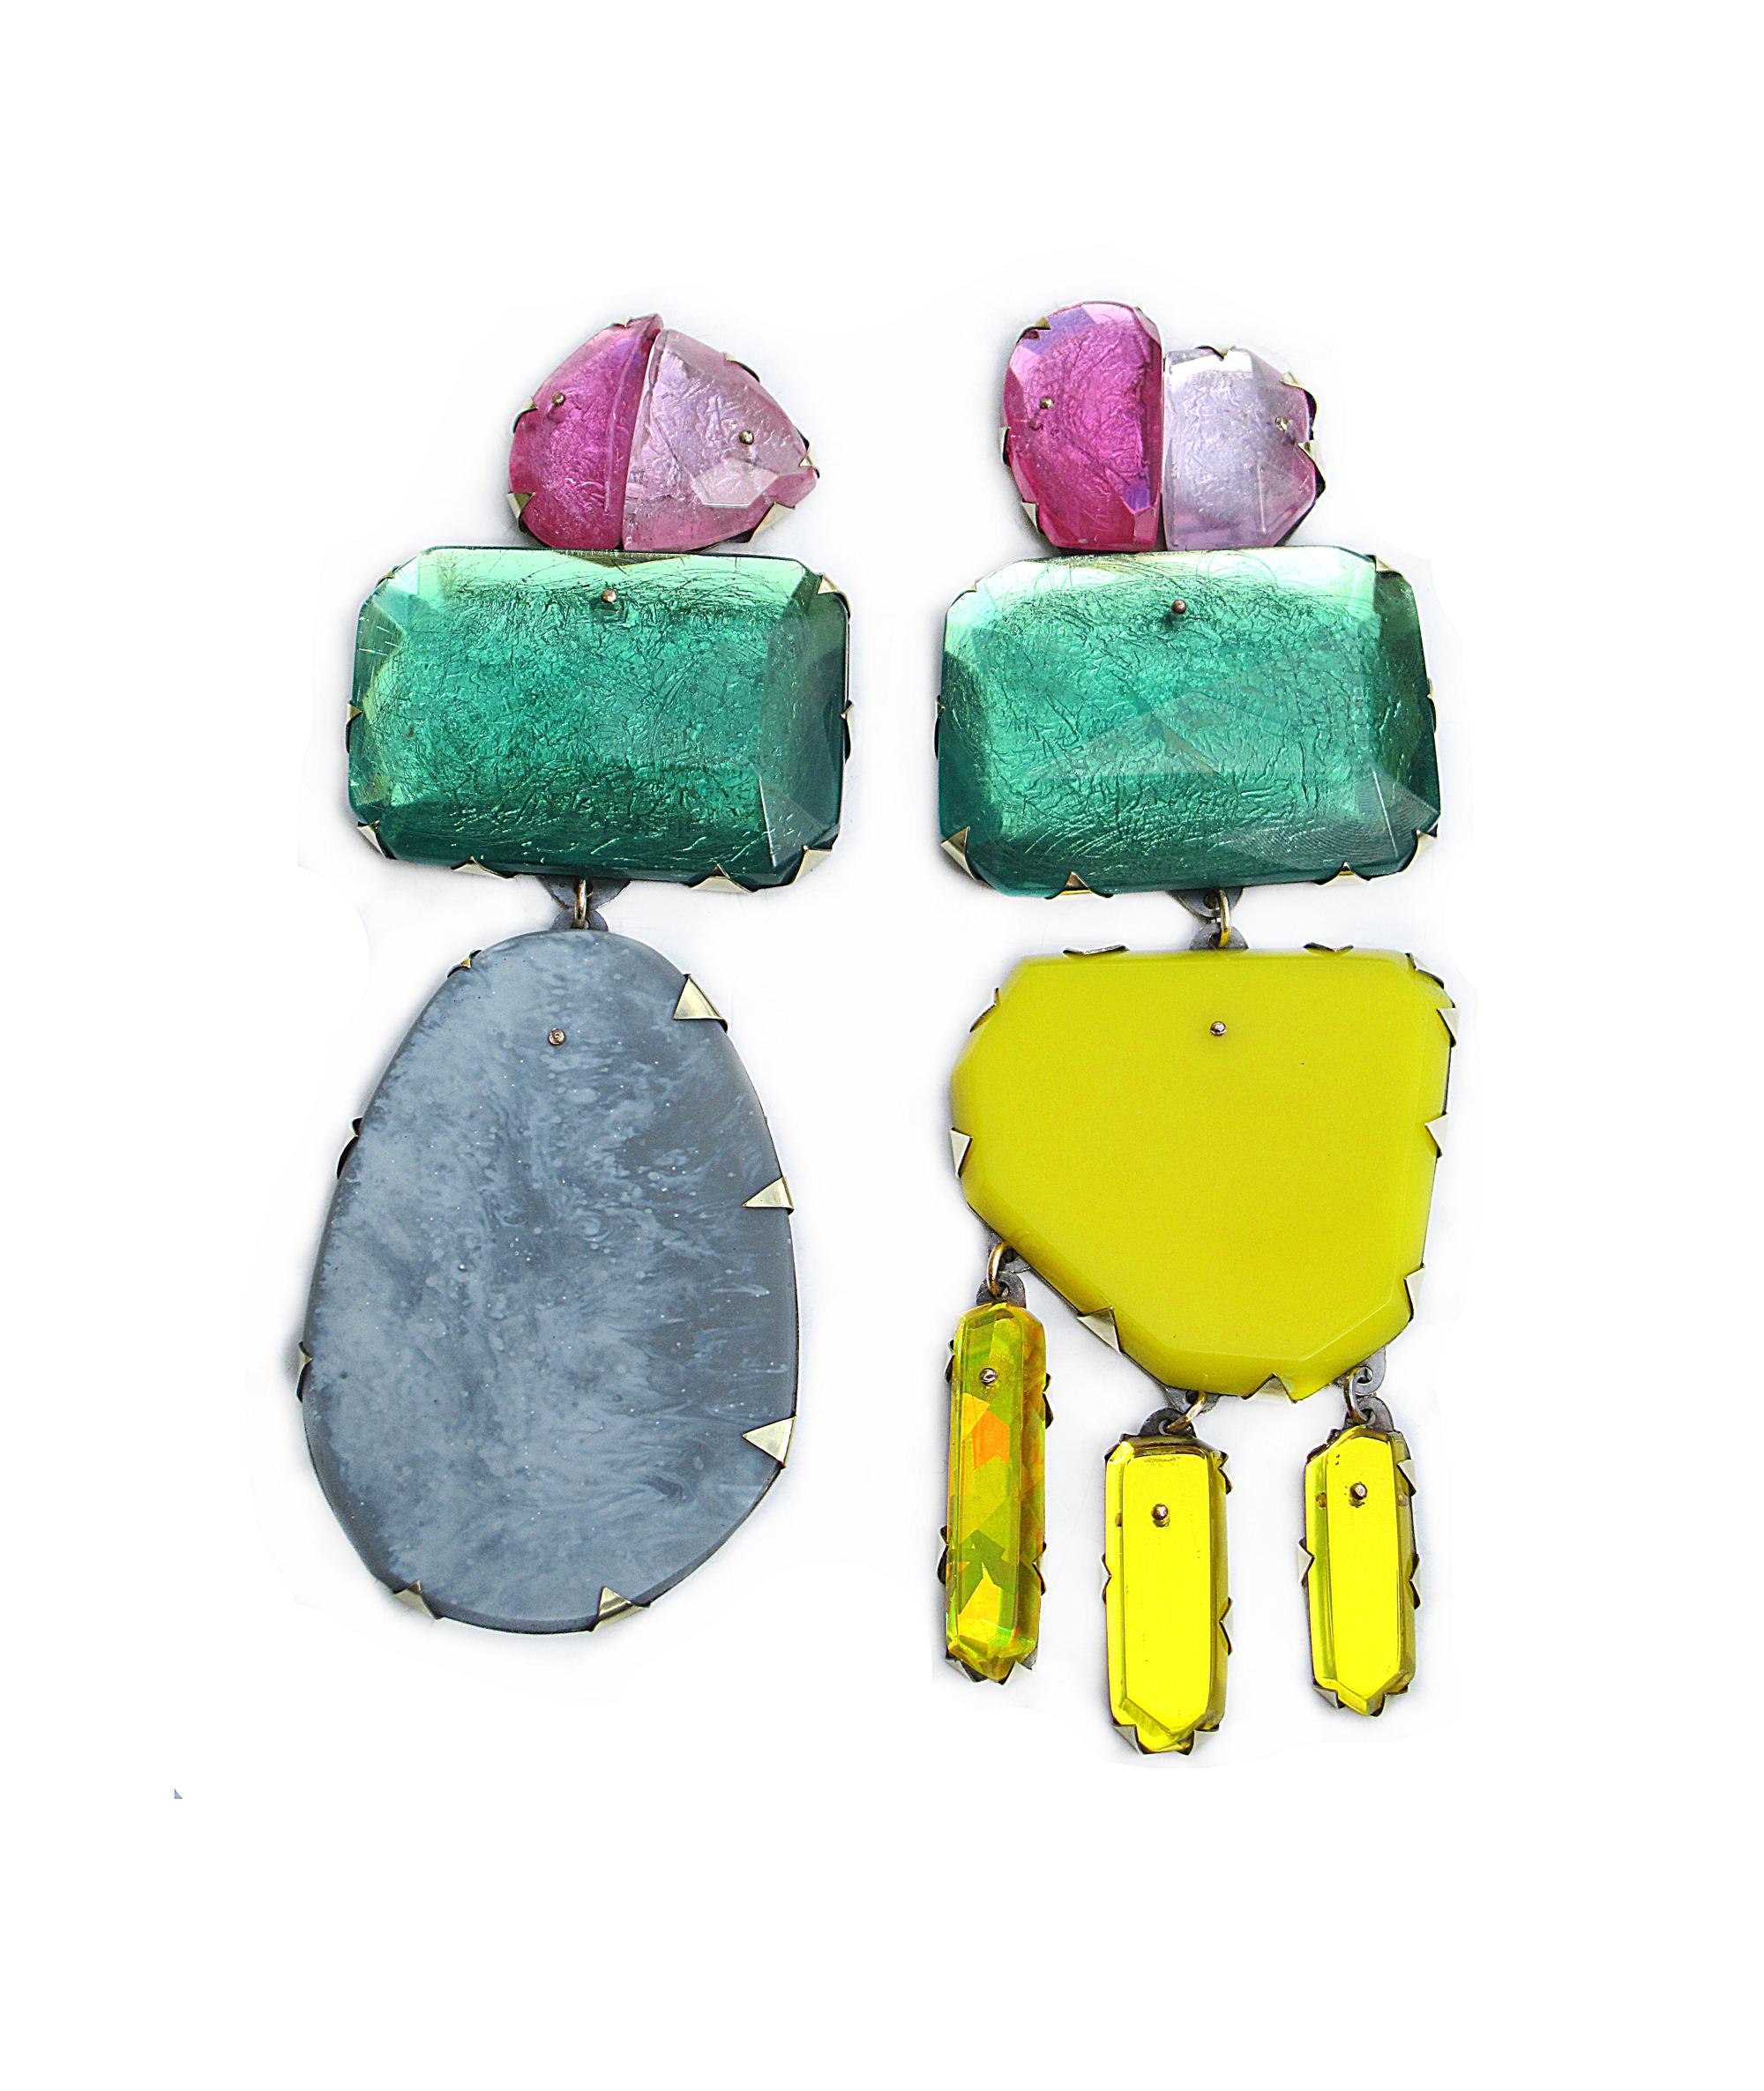 Nikki Couppee, Emerald Cocktail Earrings, Plexiglass, brass, sterling silver, fine silver